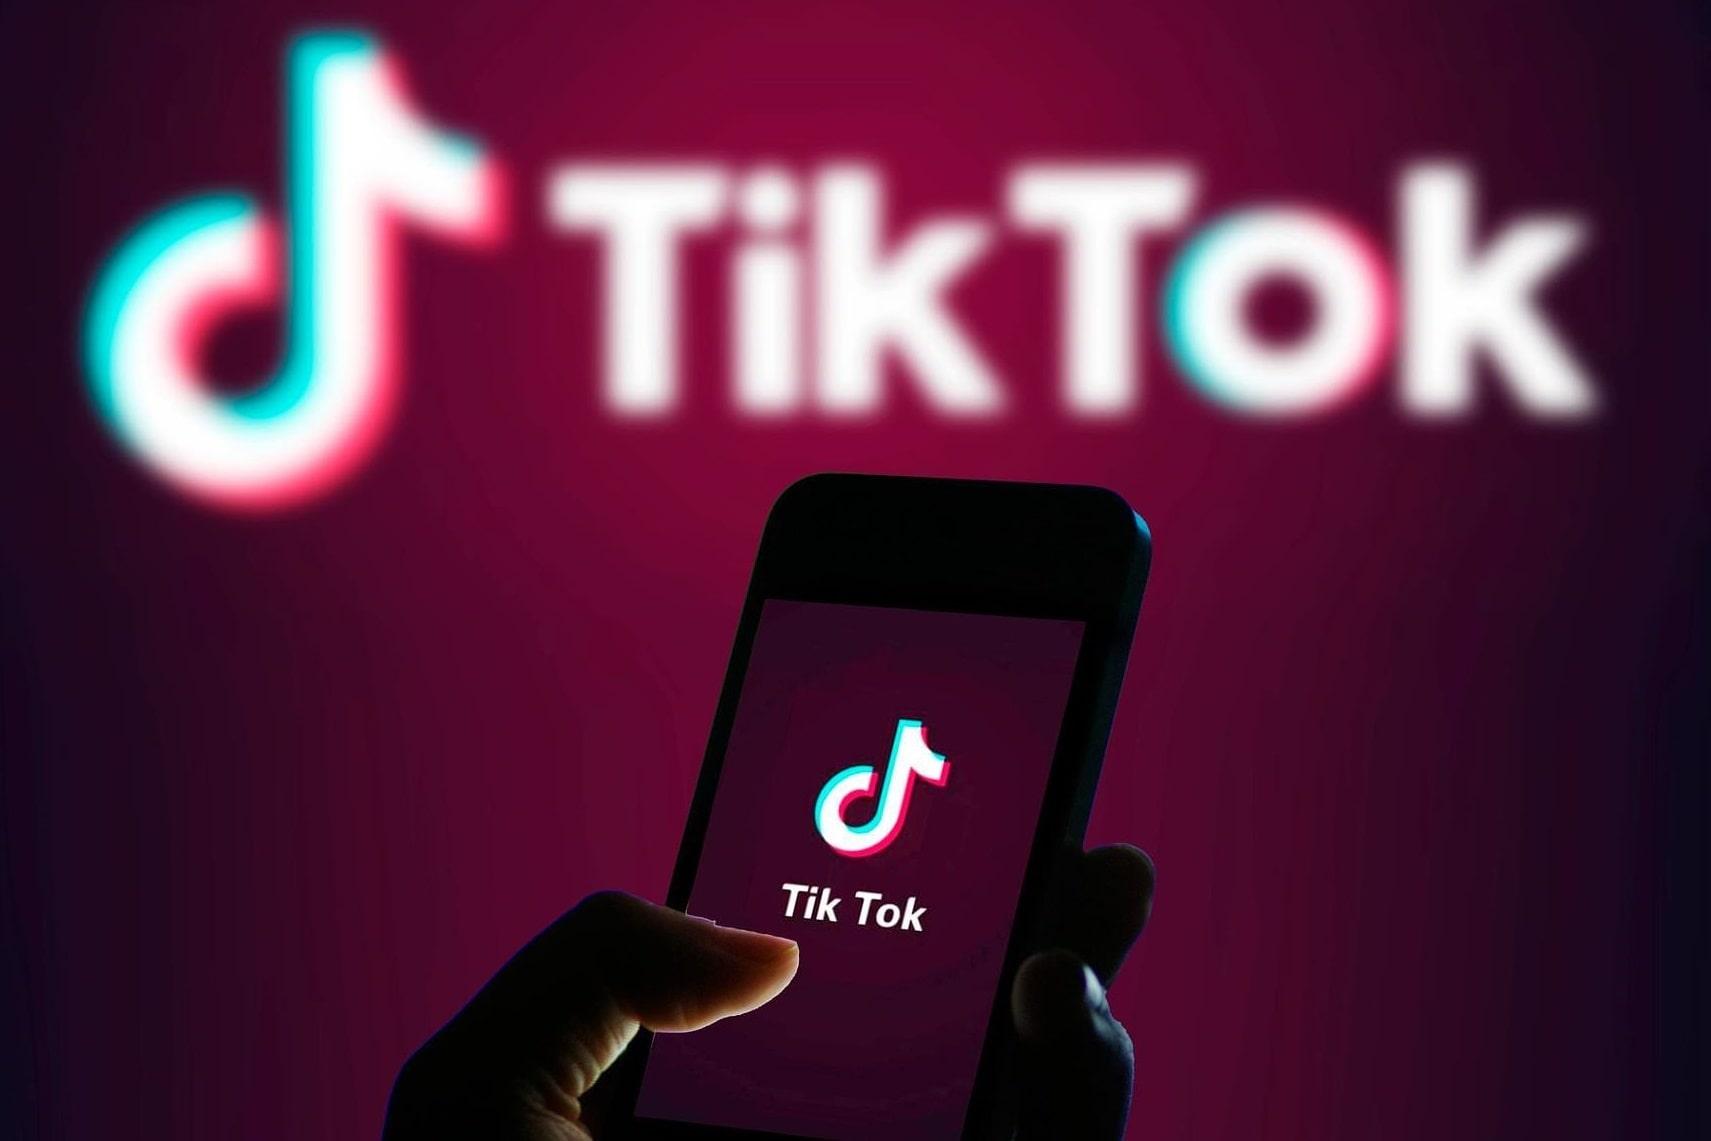 Làm sao để kiếm tiền trên TikTok